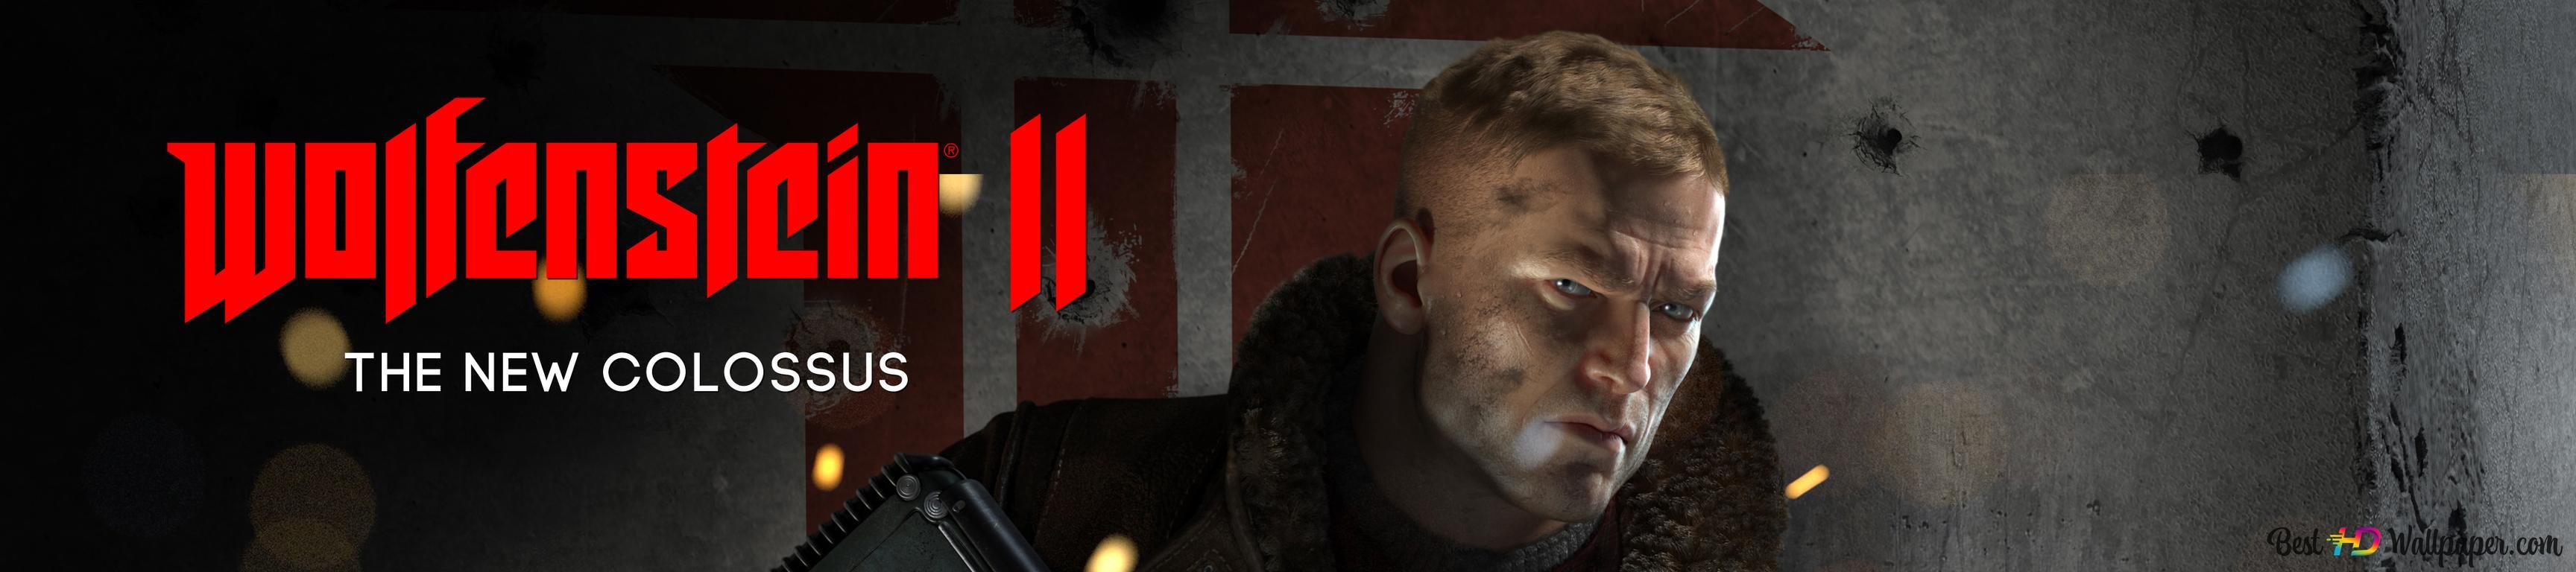 Wolfenstein Ii The New Colossus Hd Wallpaper Download